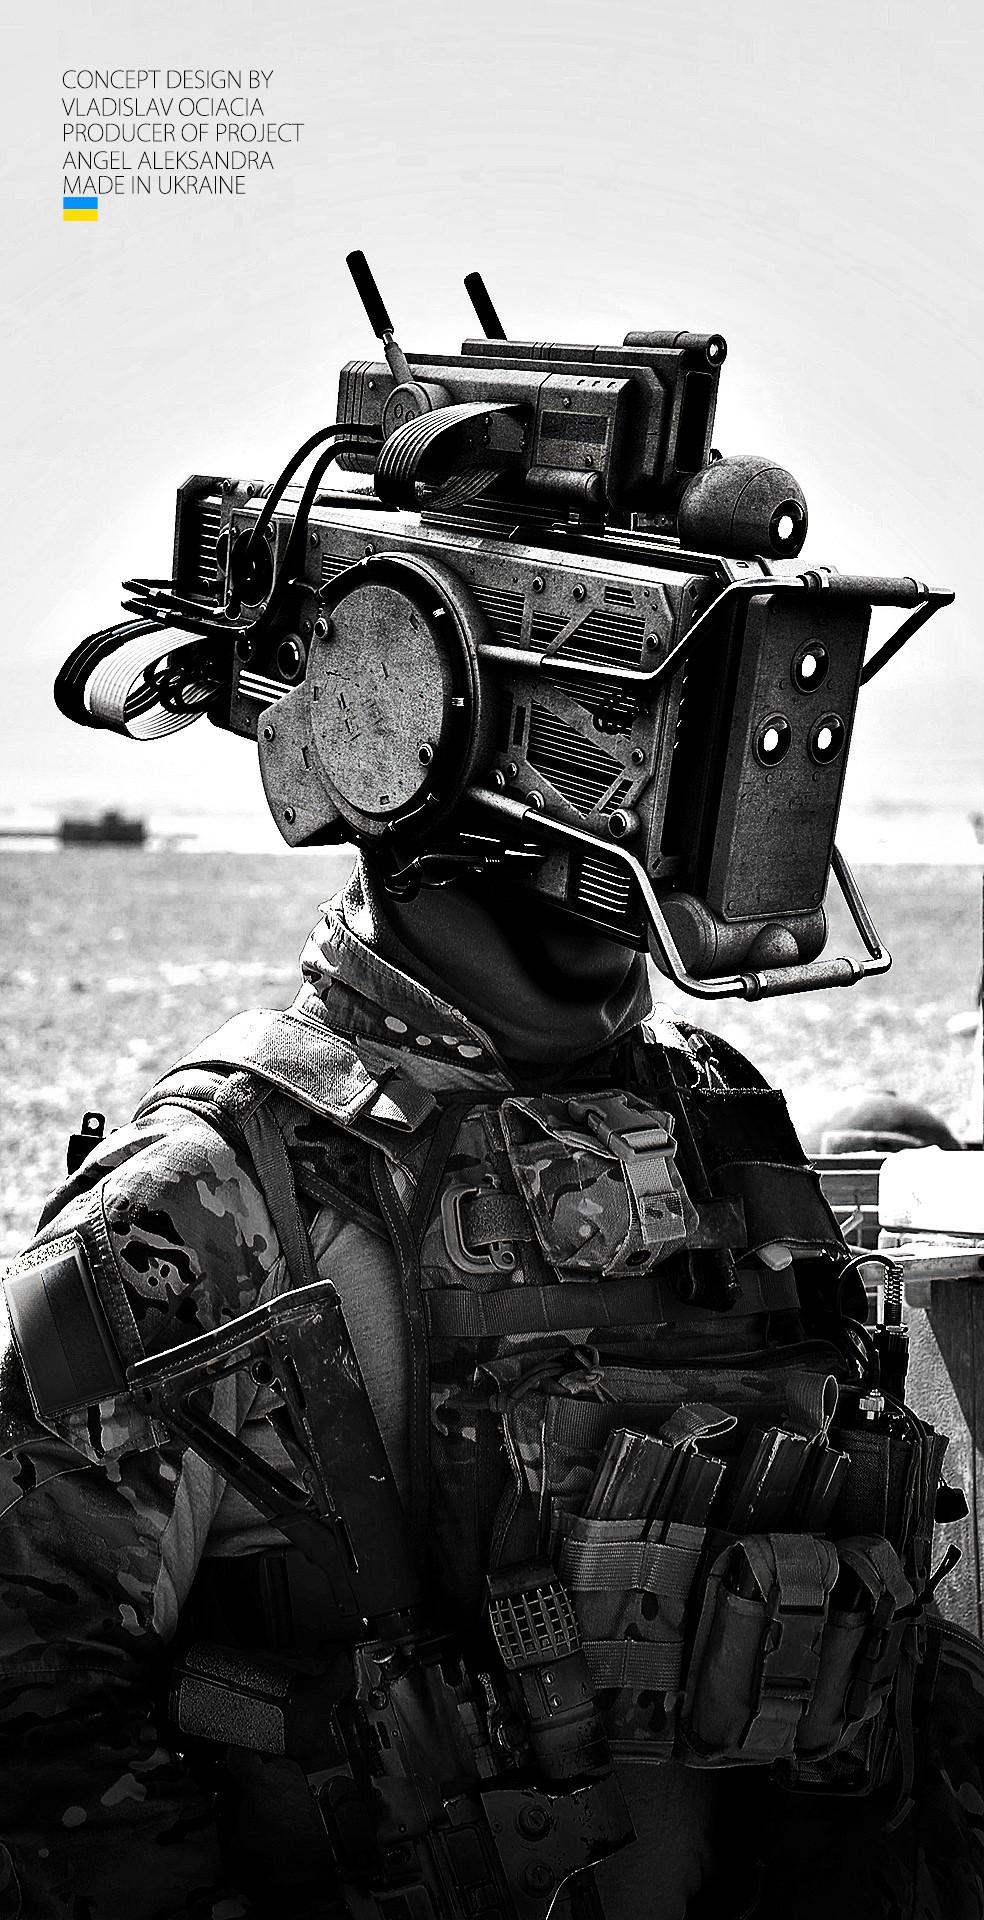 Vladislav ociacia drone soldier